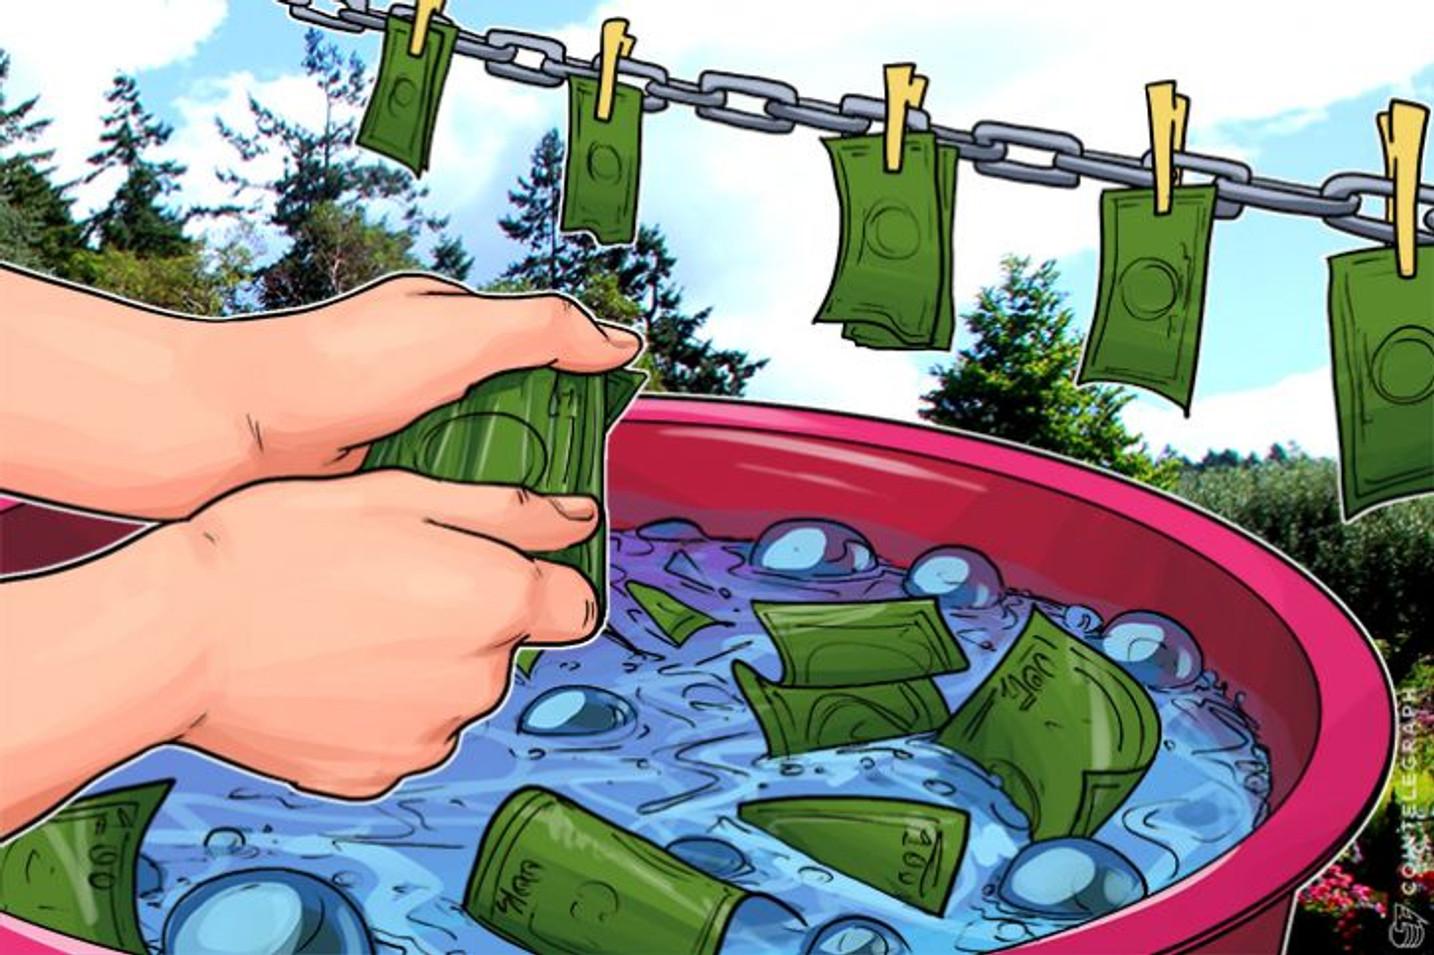 West Virginia Considers Criminalizing Bitcoin Money Laundering